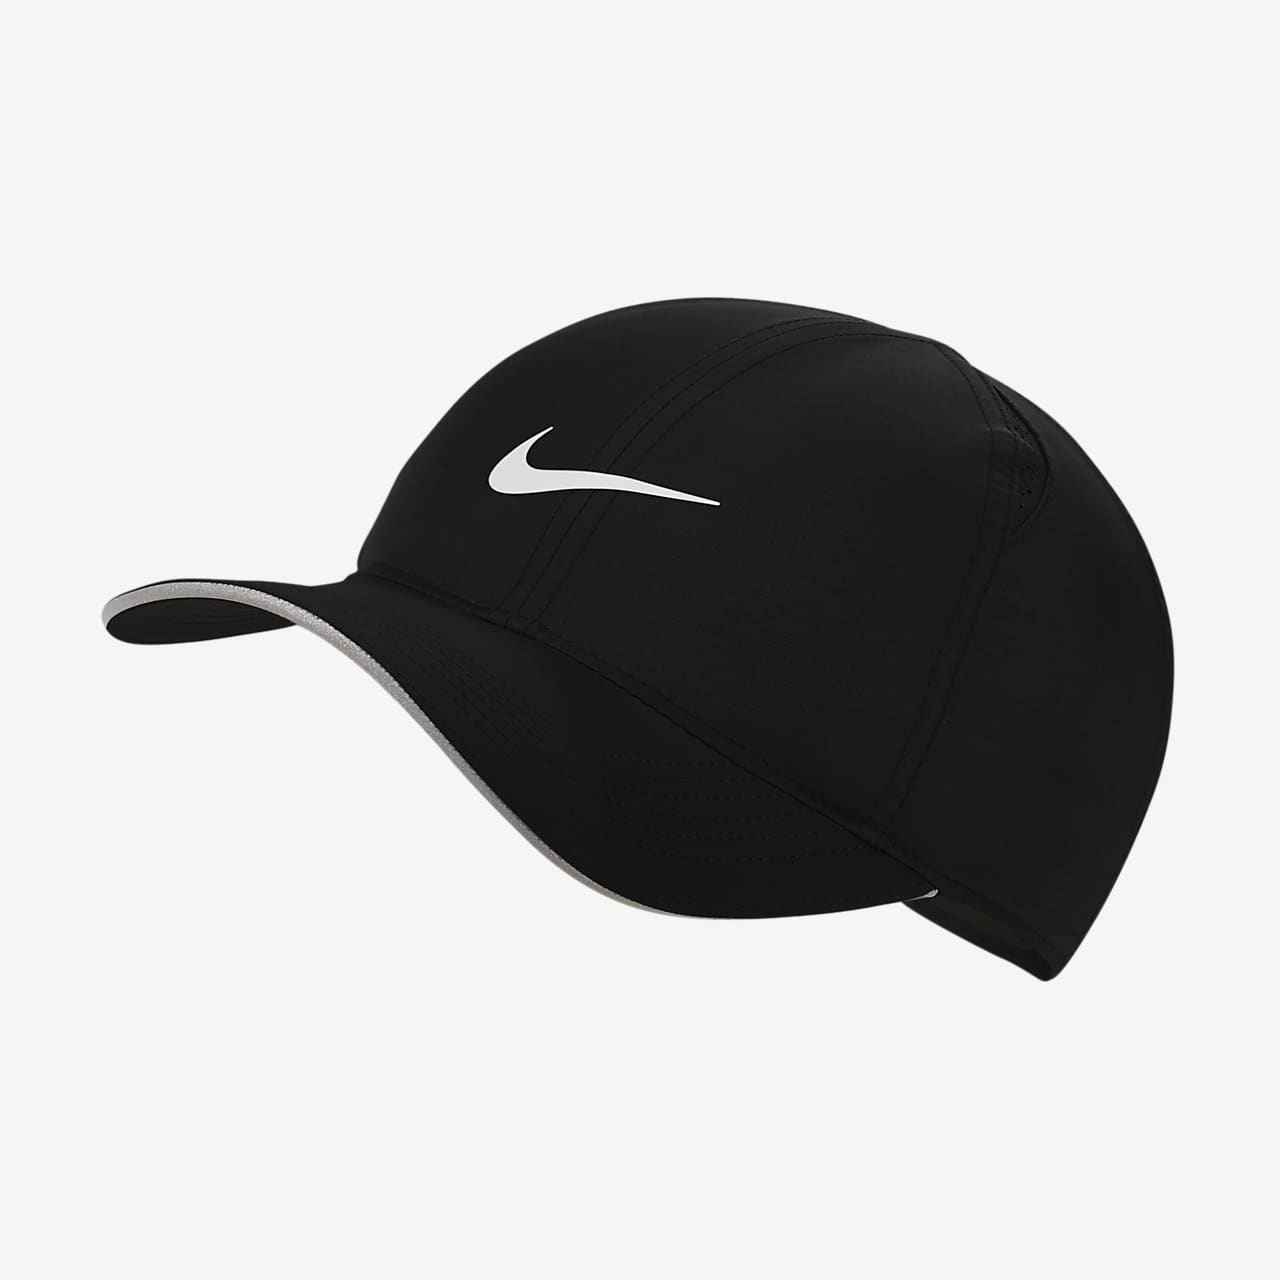 b3d8cf9783834 Nike Featherlight Adjustable Running Hat. Nike.com